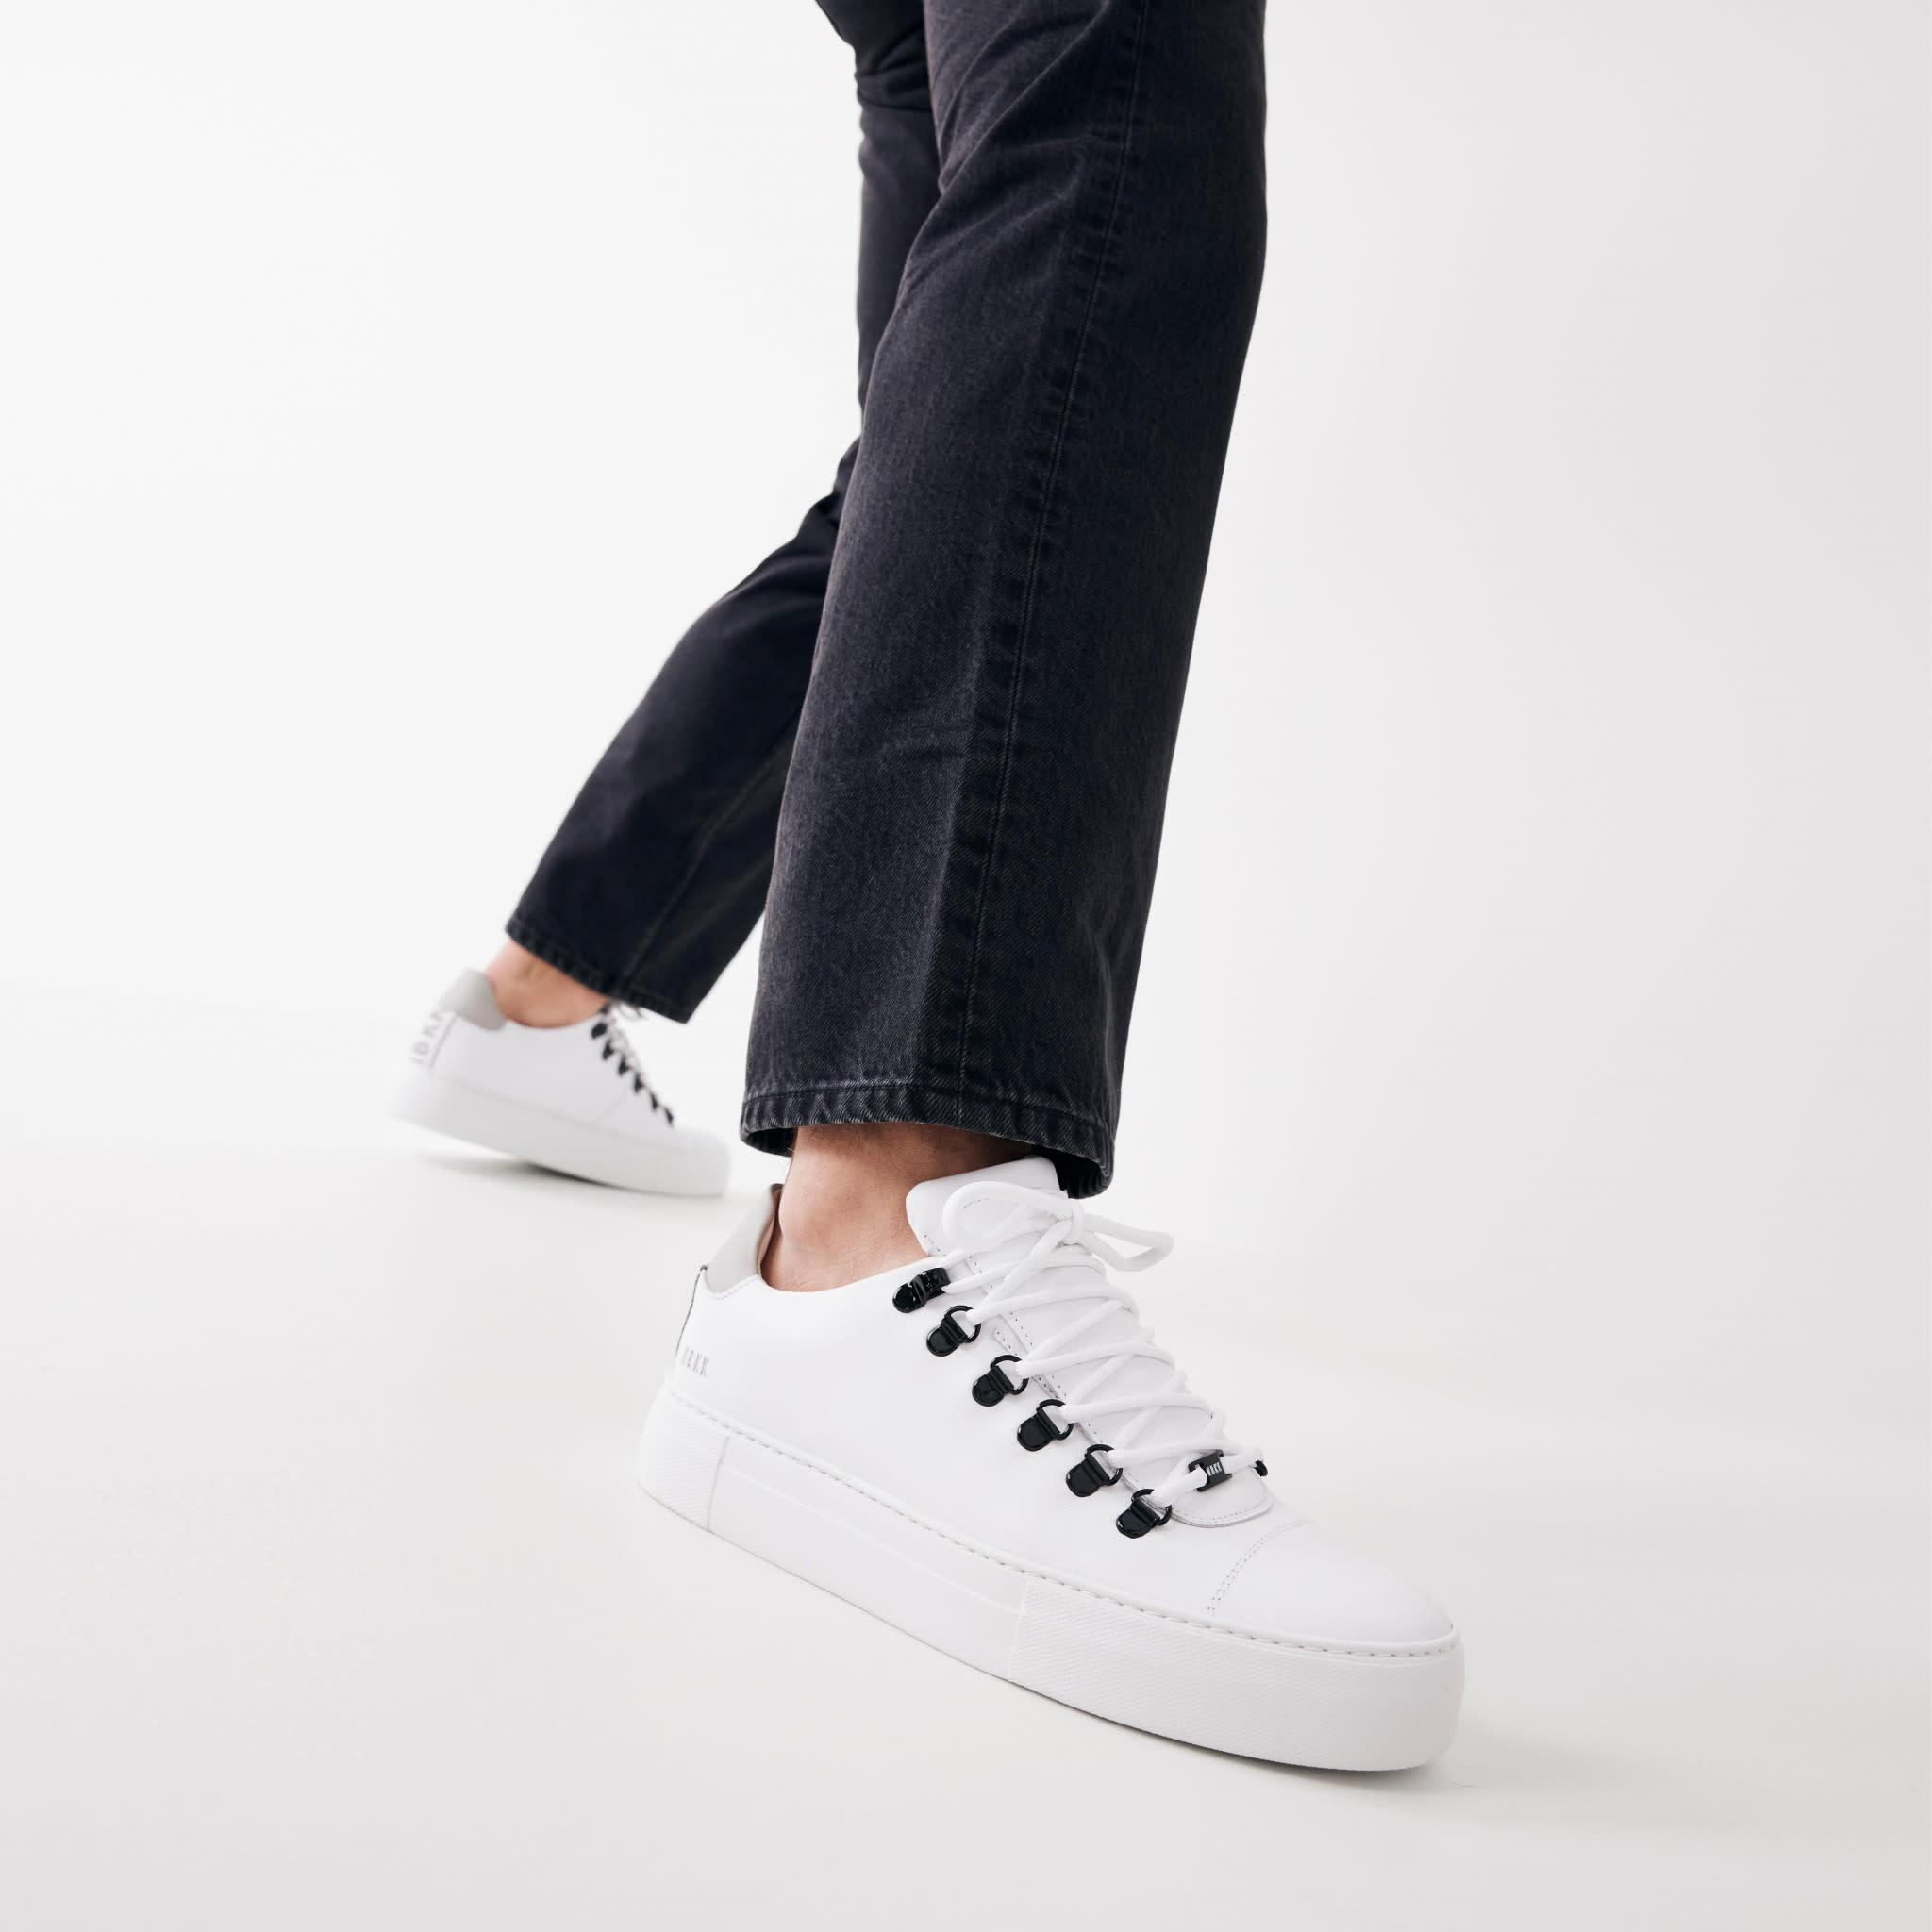 Jagger Classic white-5